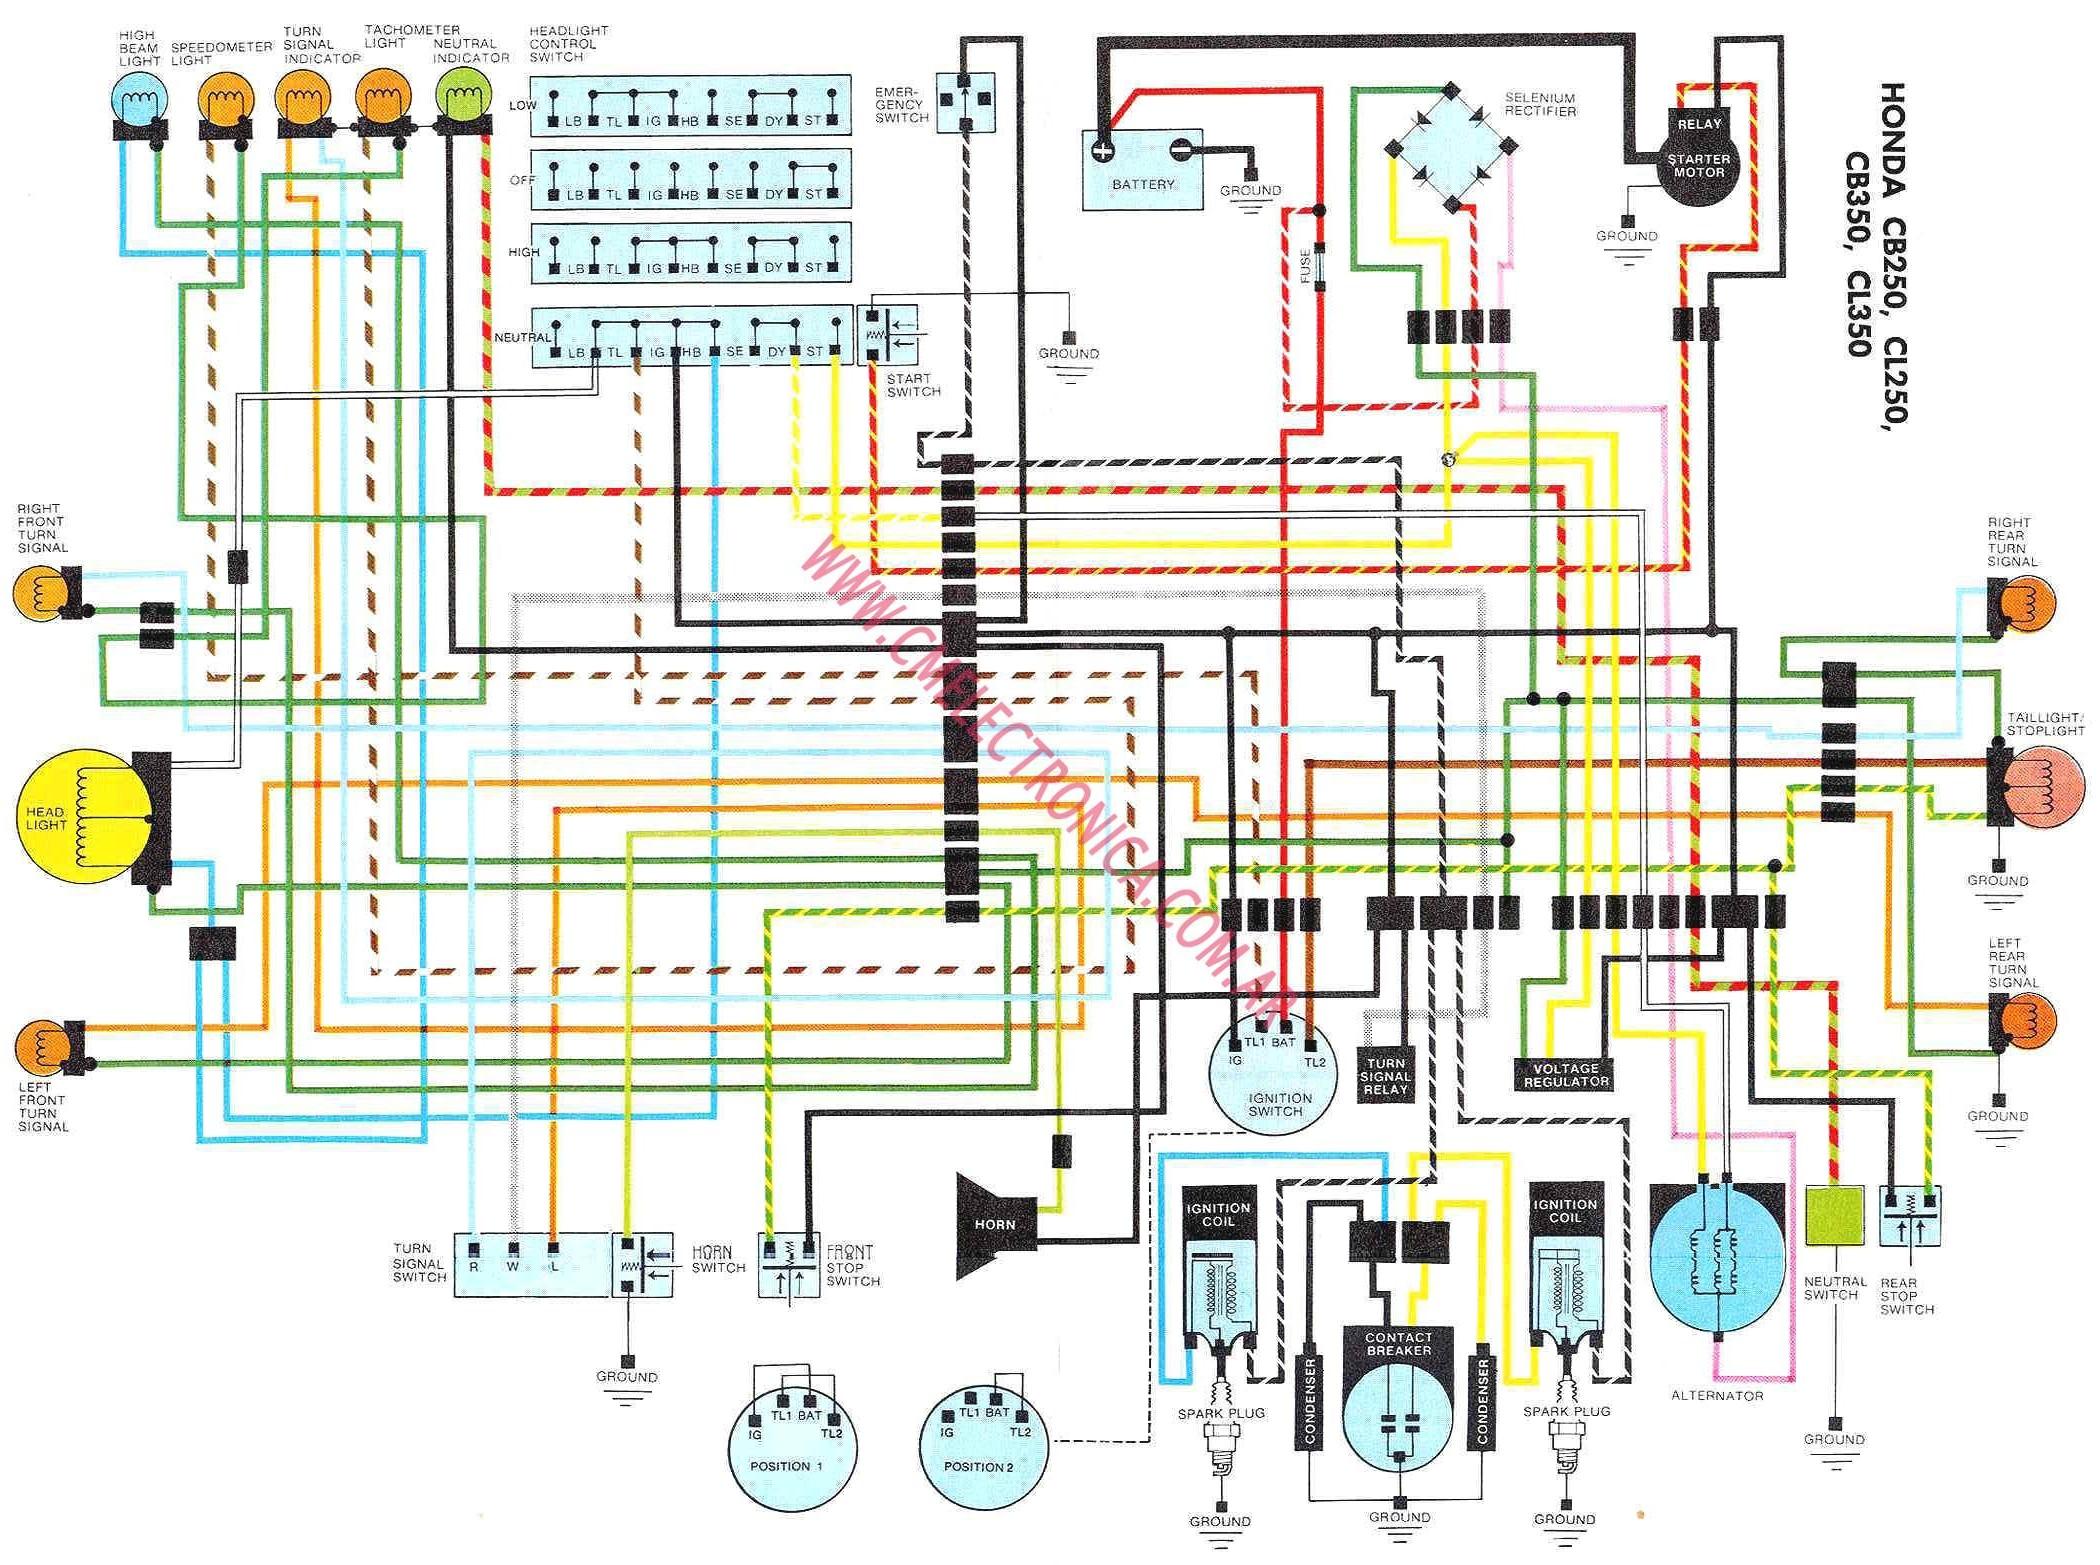 honda cb400 four wiring diagram vga to av cable manuales usuario y taller – cb 250 two fifty